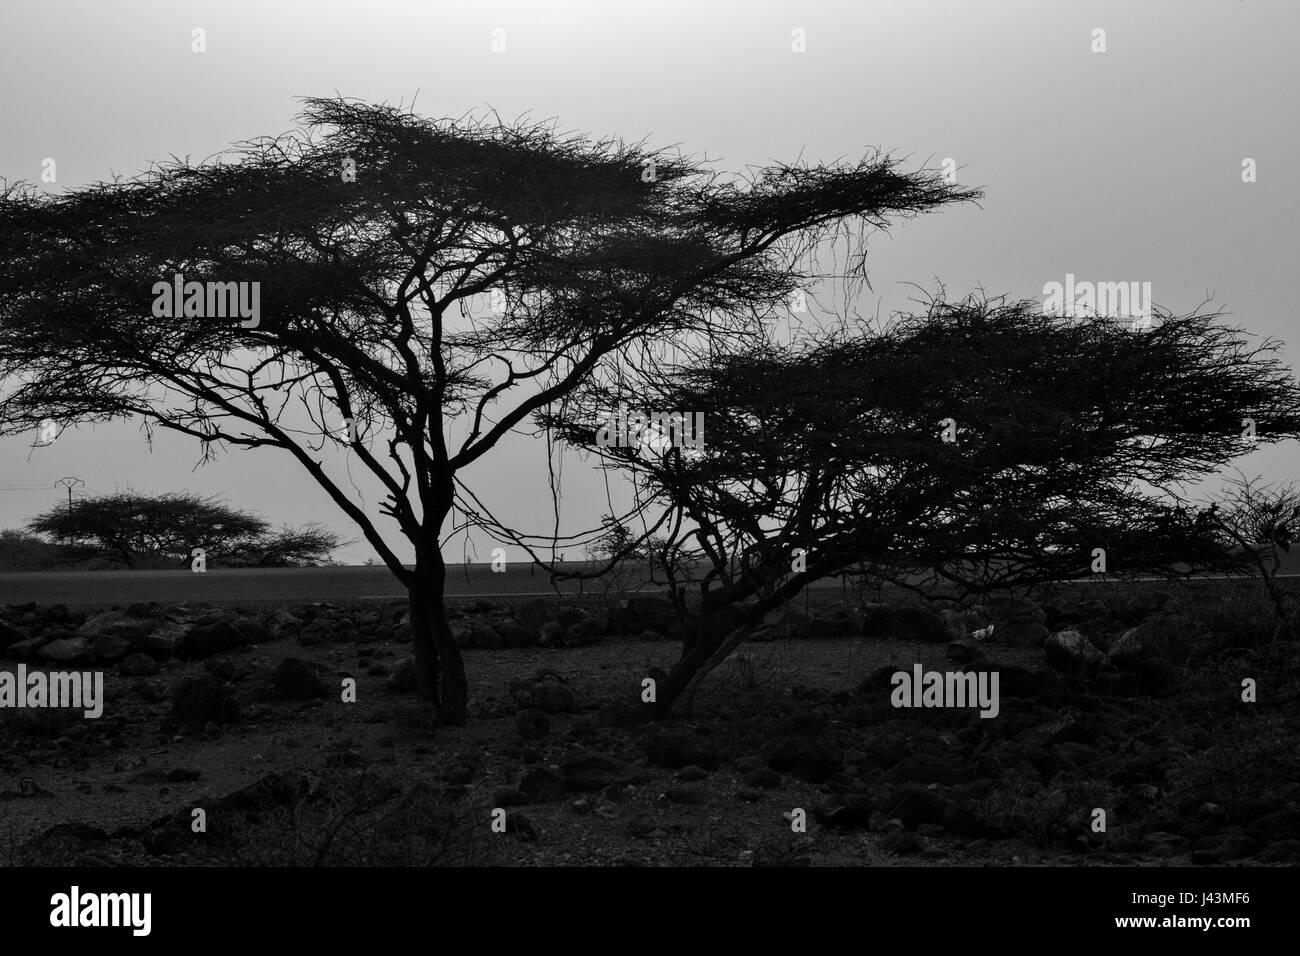 Acacias Tree in Arta Region in Djibouti - Stock Image